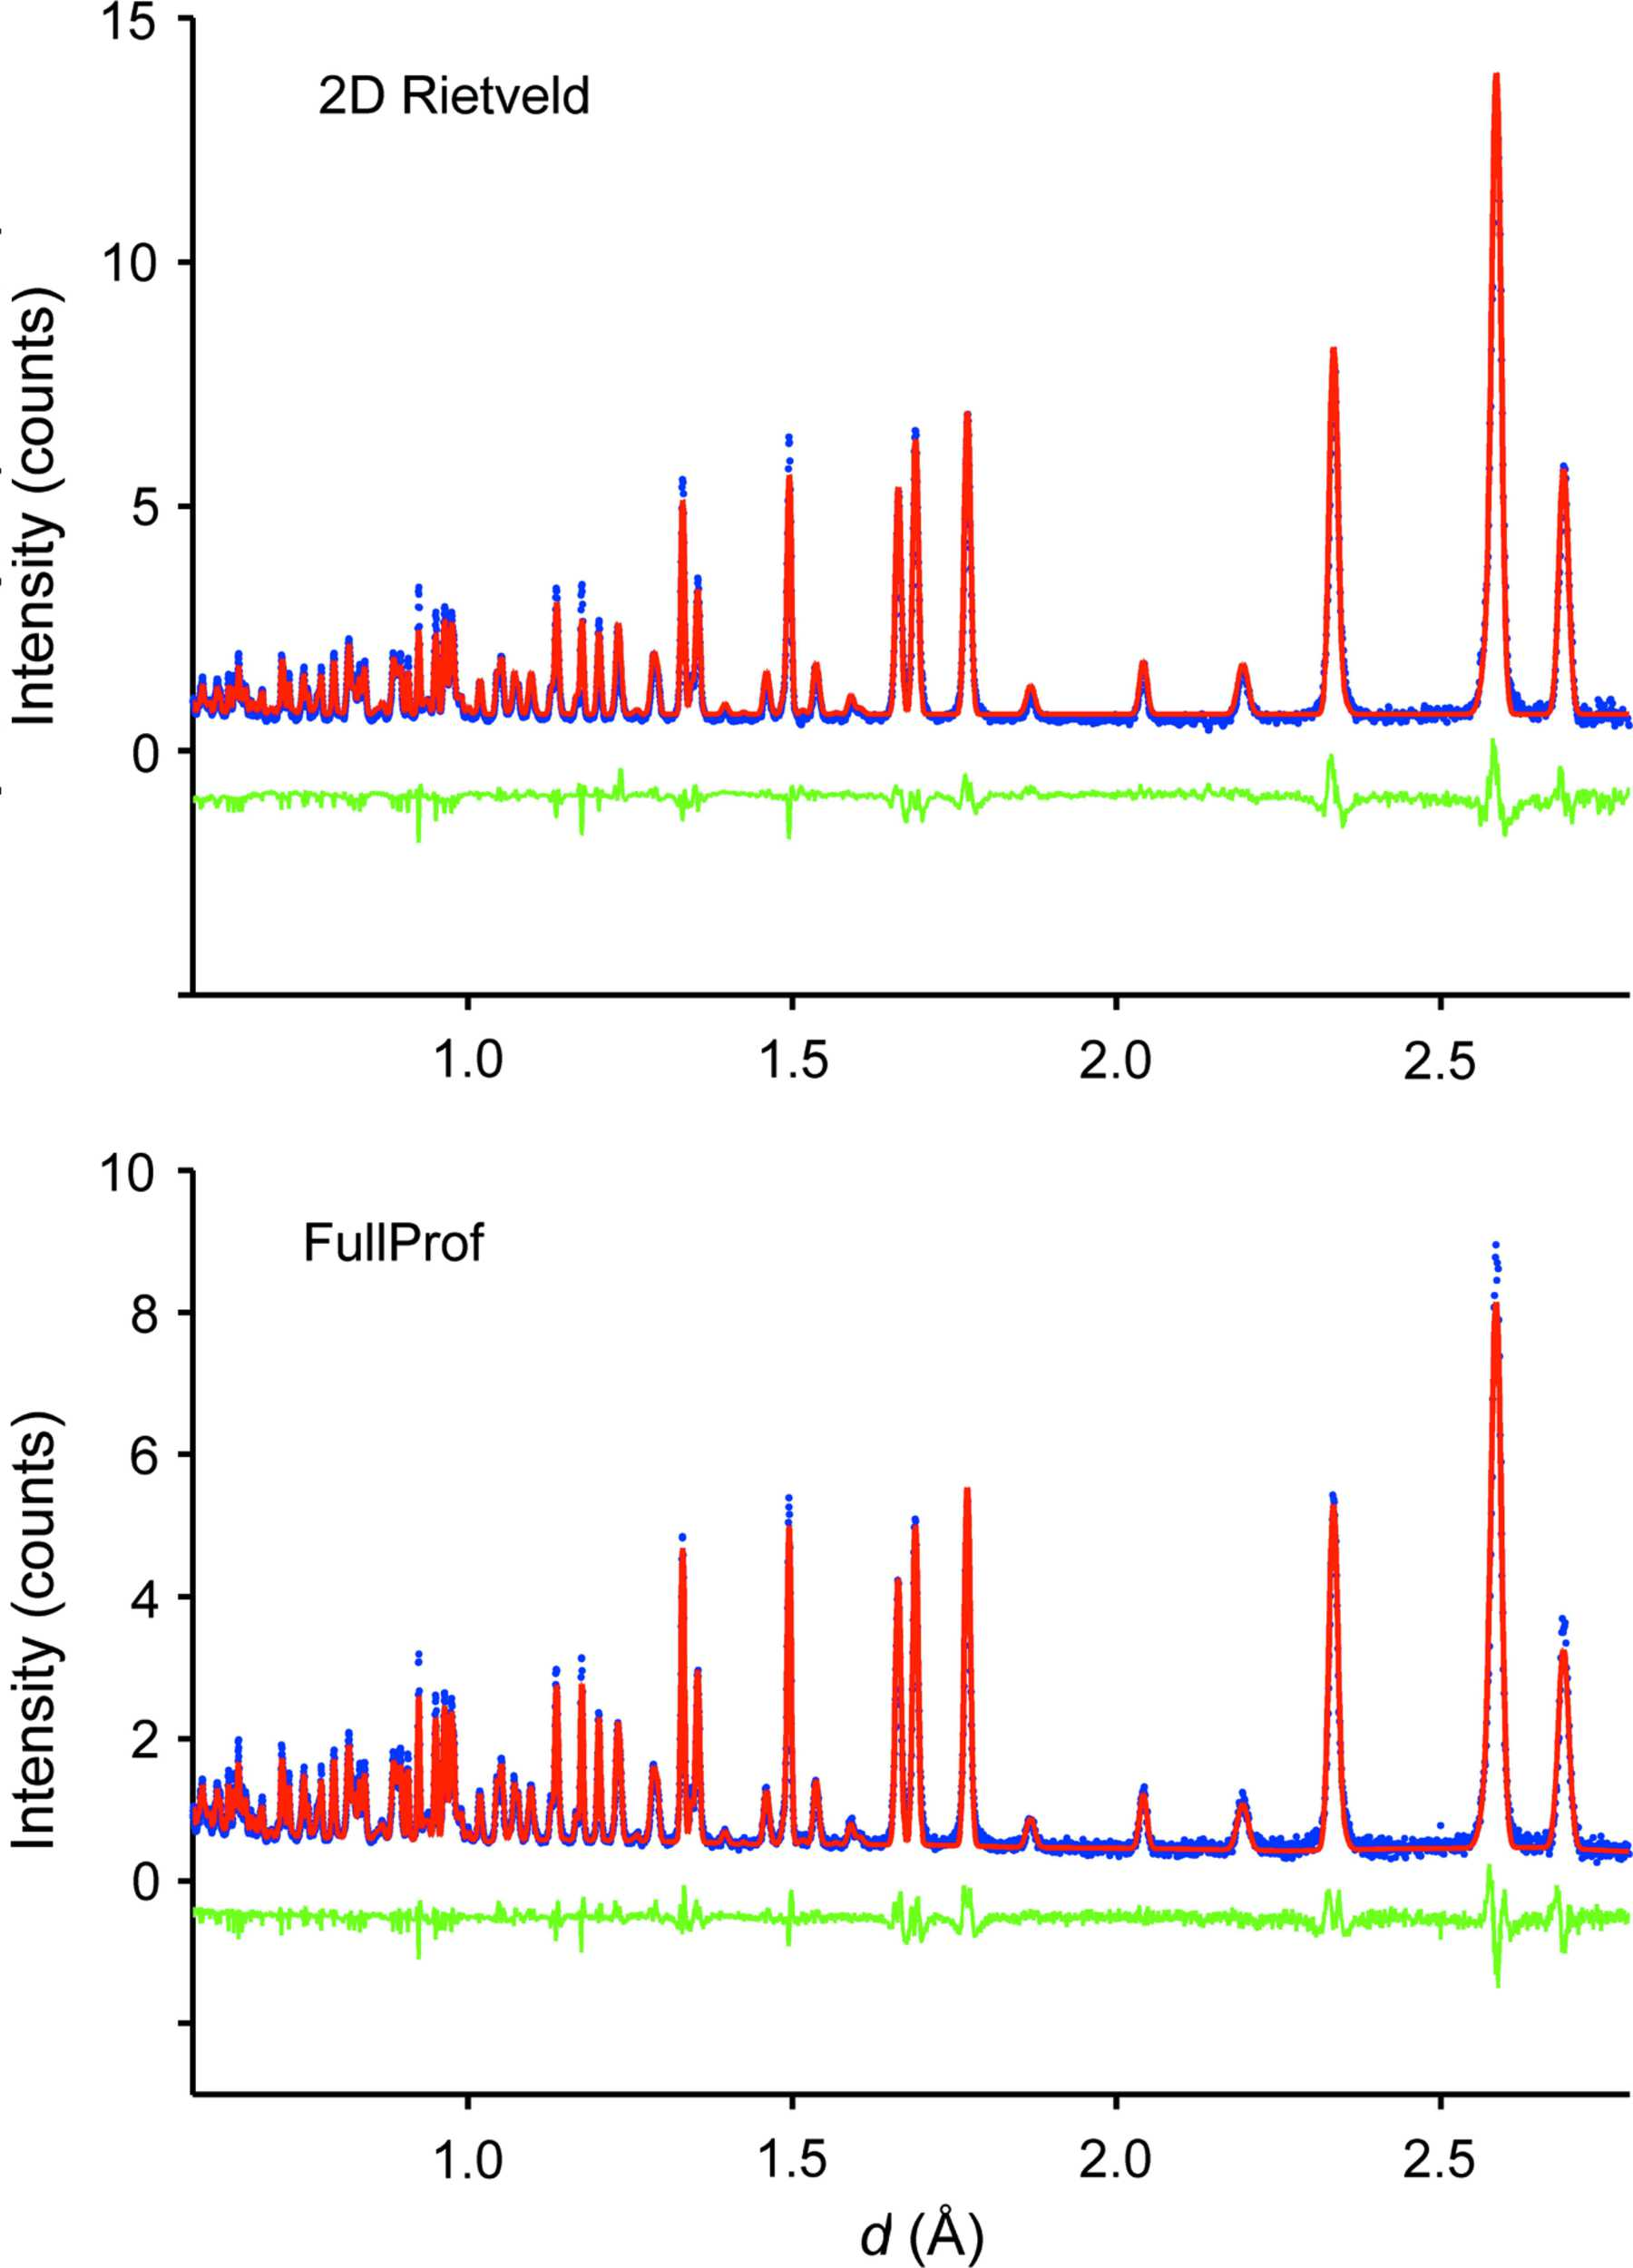 IUCr) A Rietveld refinement method for angular- and wavelength